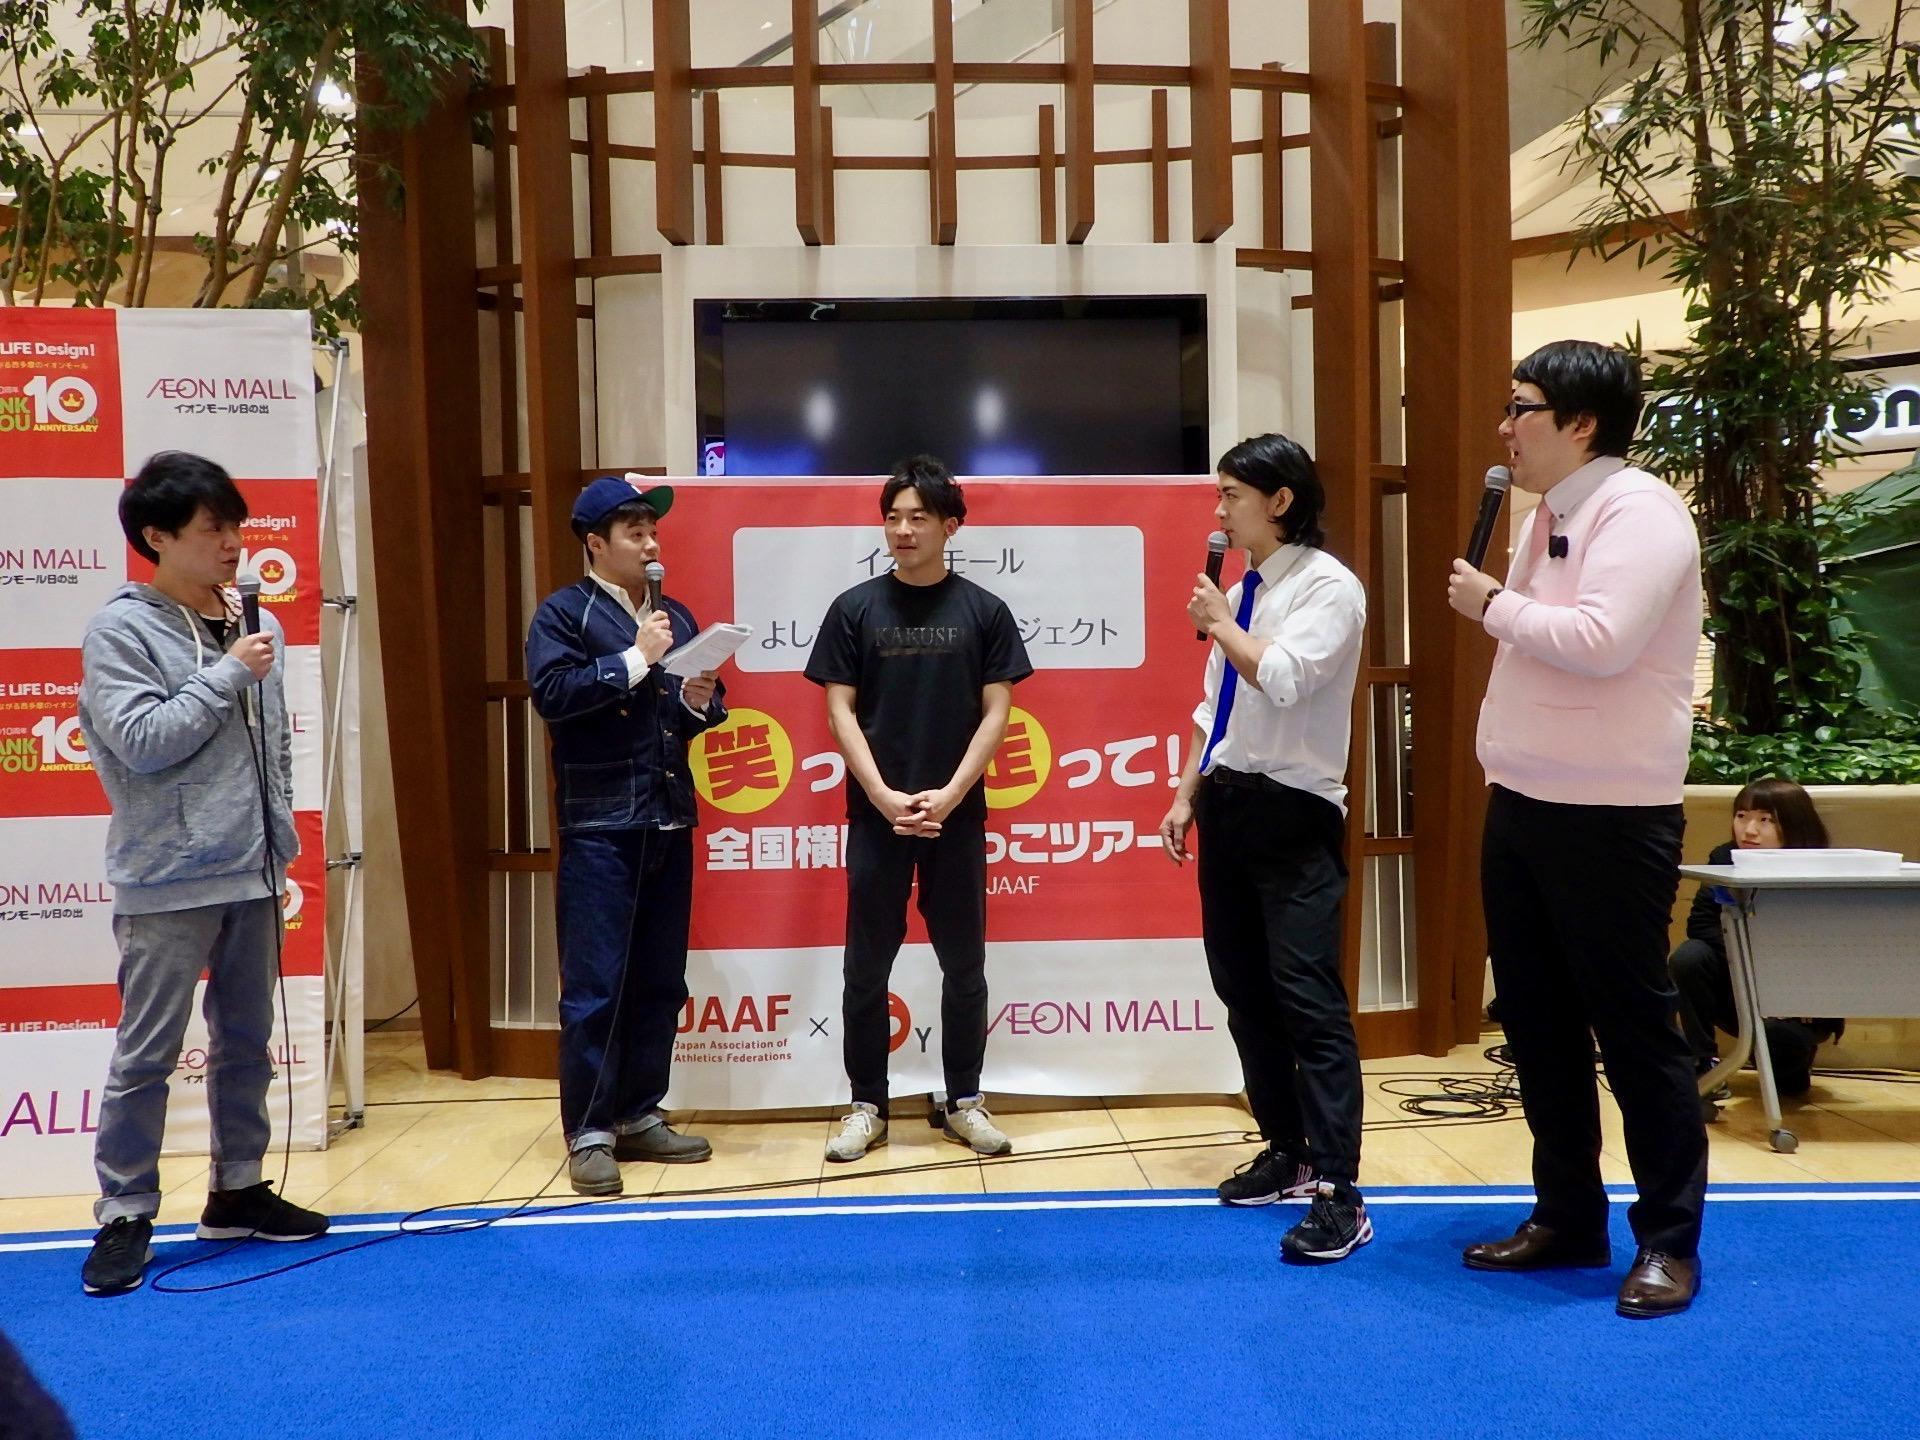 http://news.yoshimoto.co.jp/20180211195041-41d2e20a358faaee32845e1b69f27551250476ab.jpg